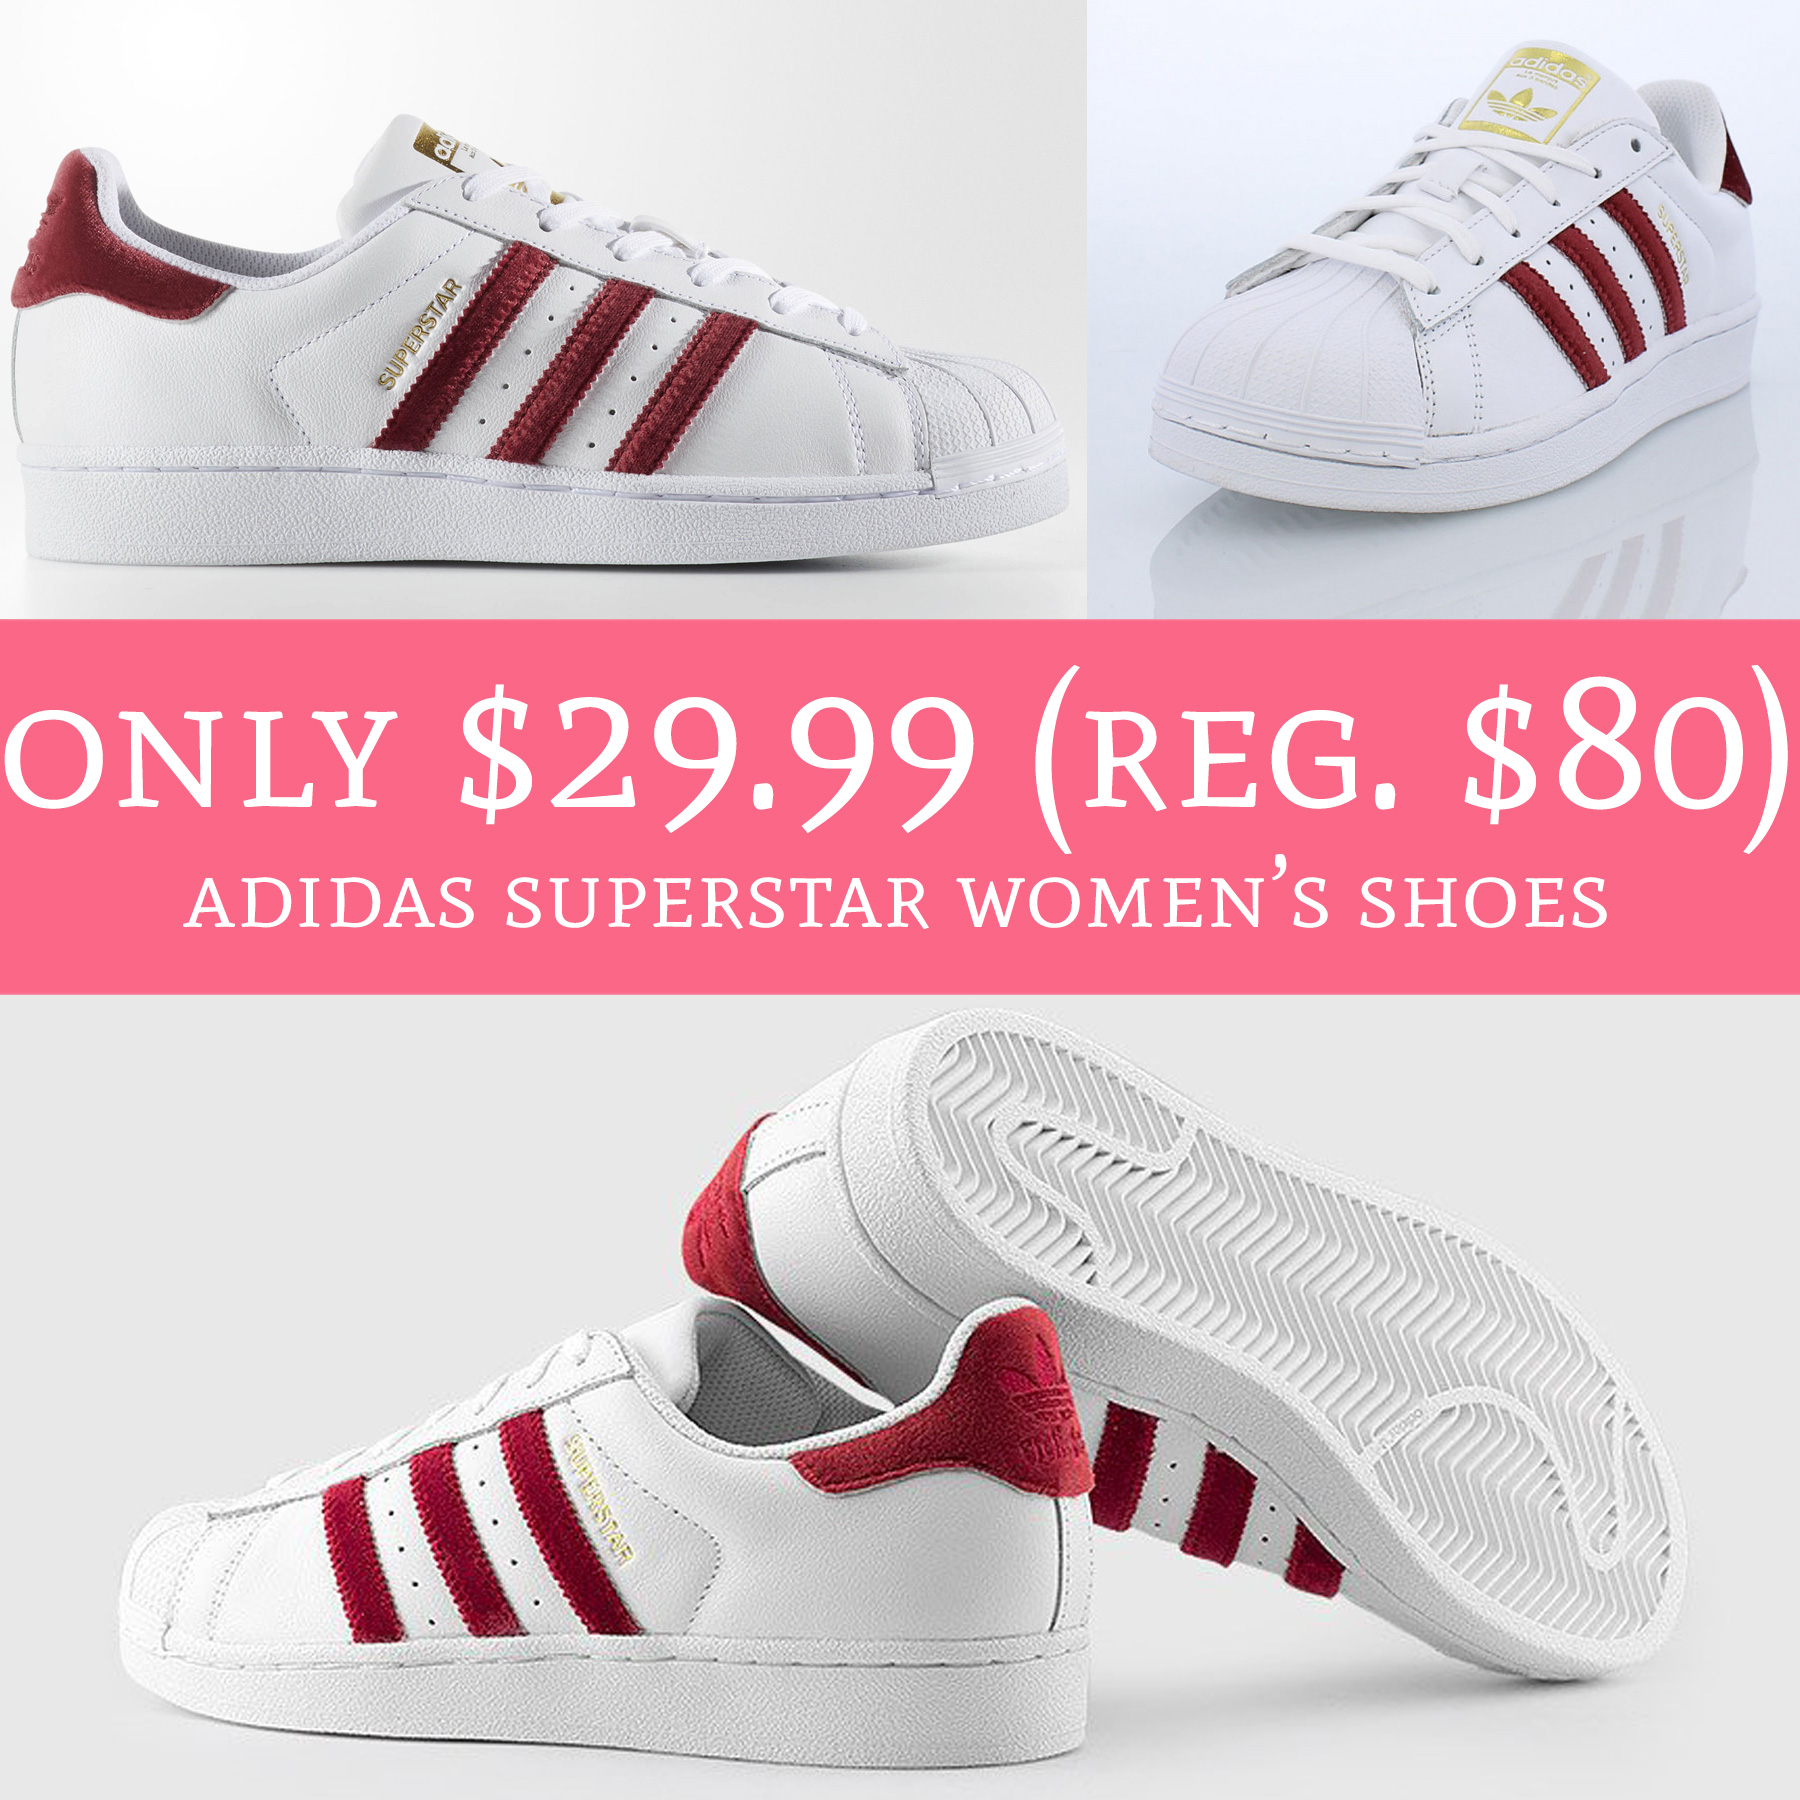 adidas superstar free shipping